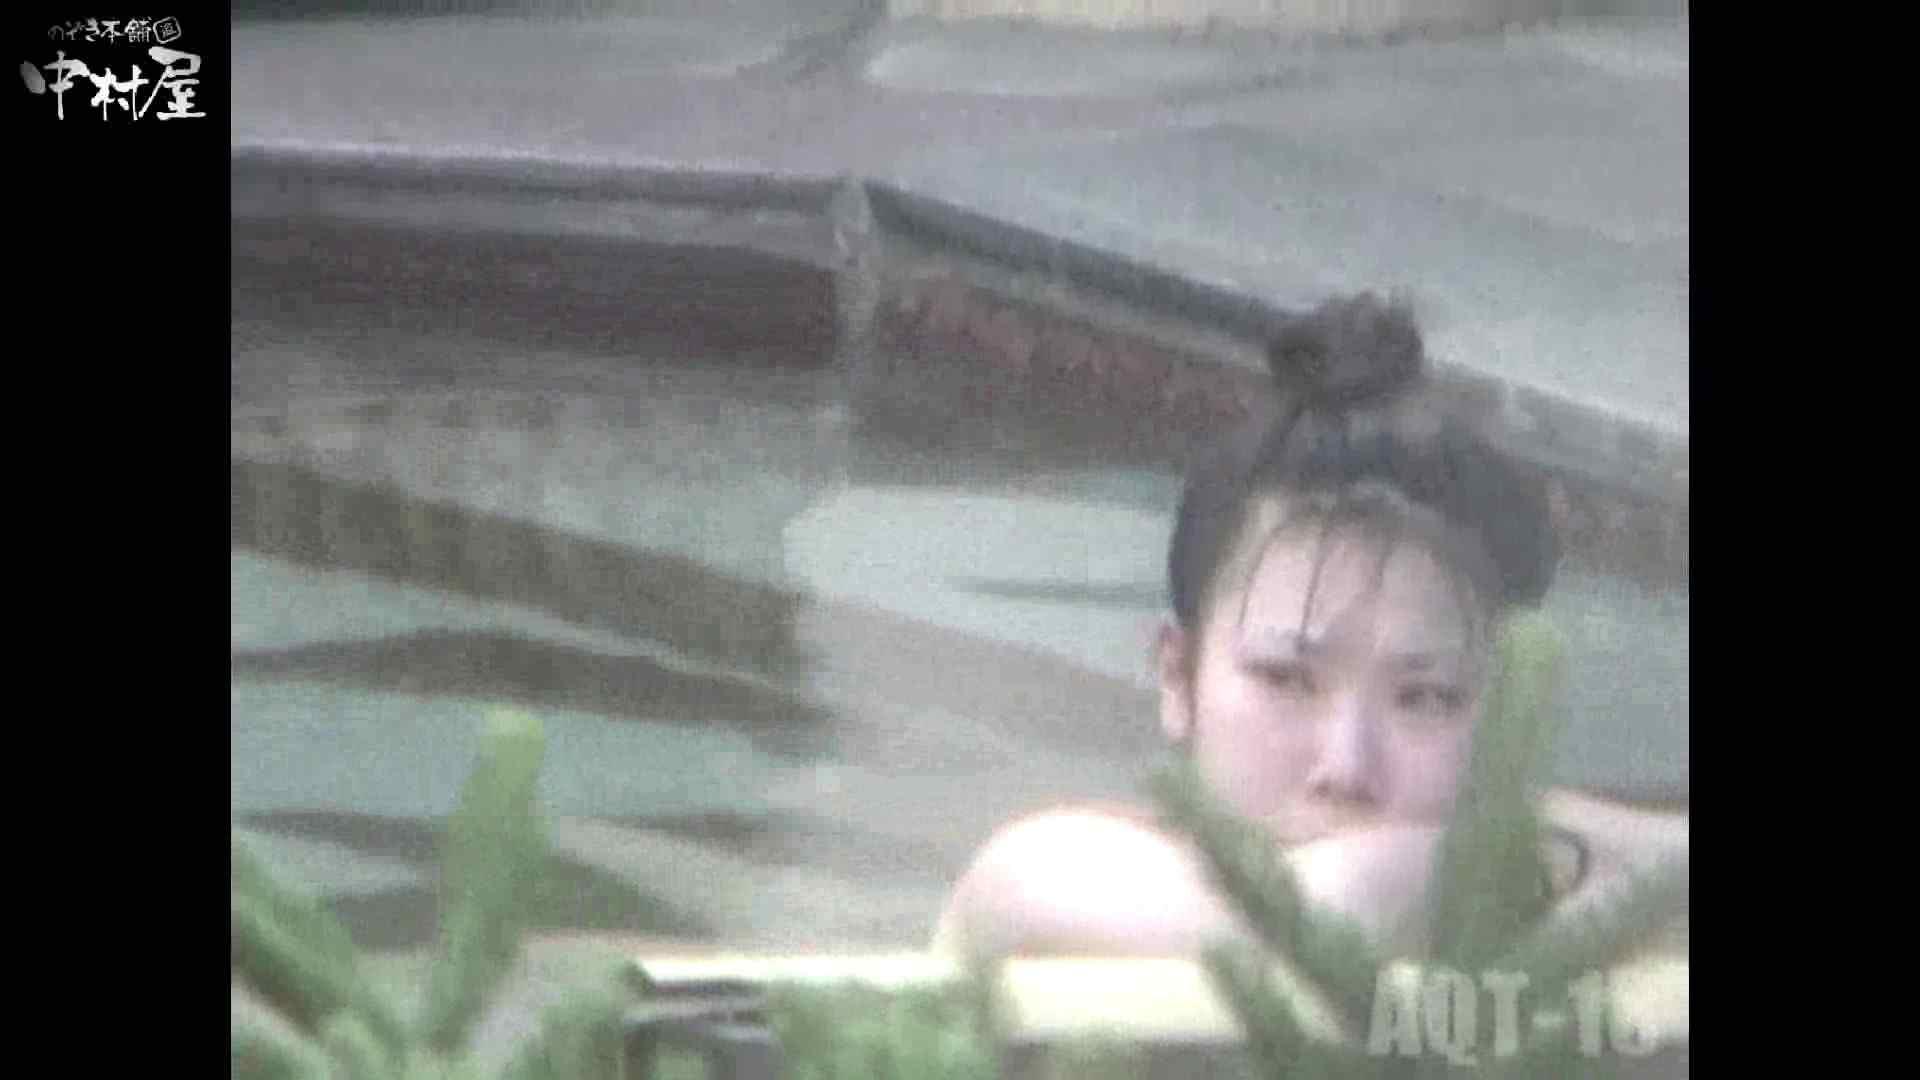 Aquaな露天風呂Vol.882潜入盗撮露天風呂十八判湯 其の二 露天 | 潜入  78PICs 77